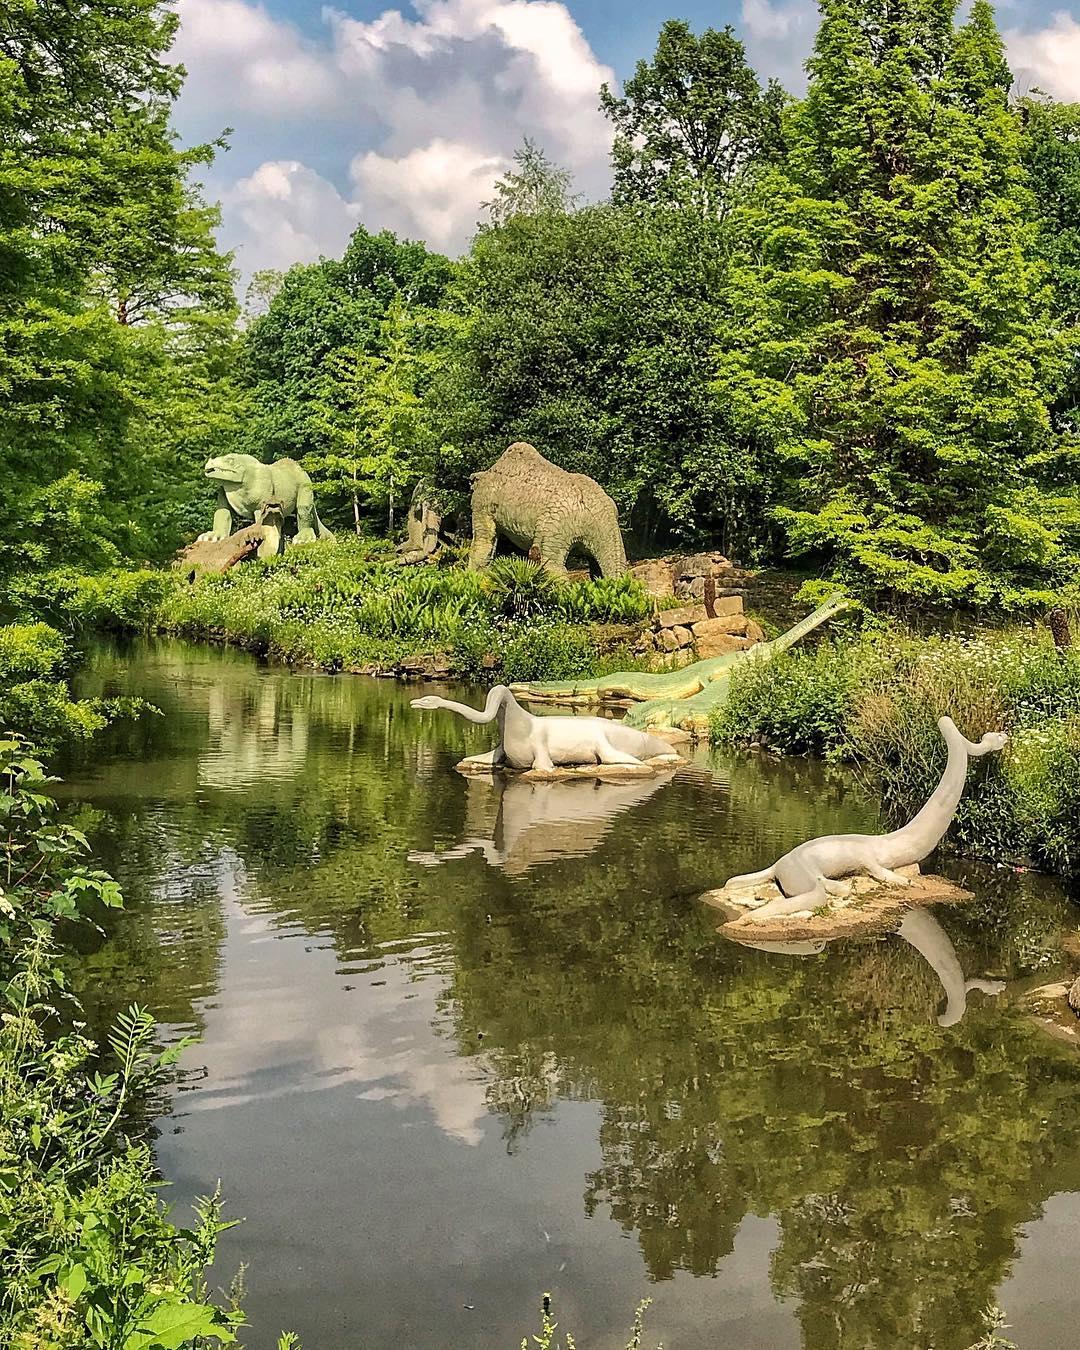 crystal-palace-dinosaurs-instagram